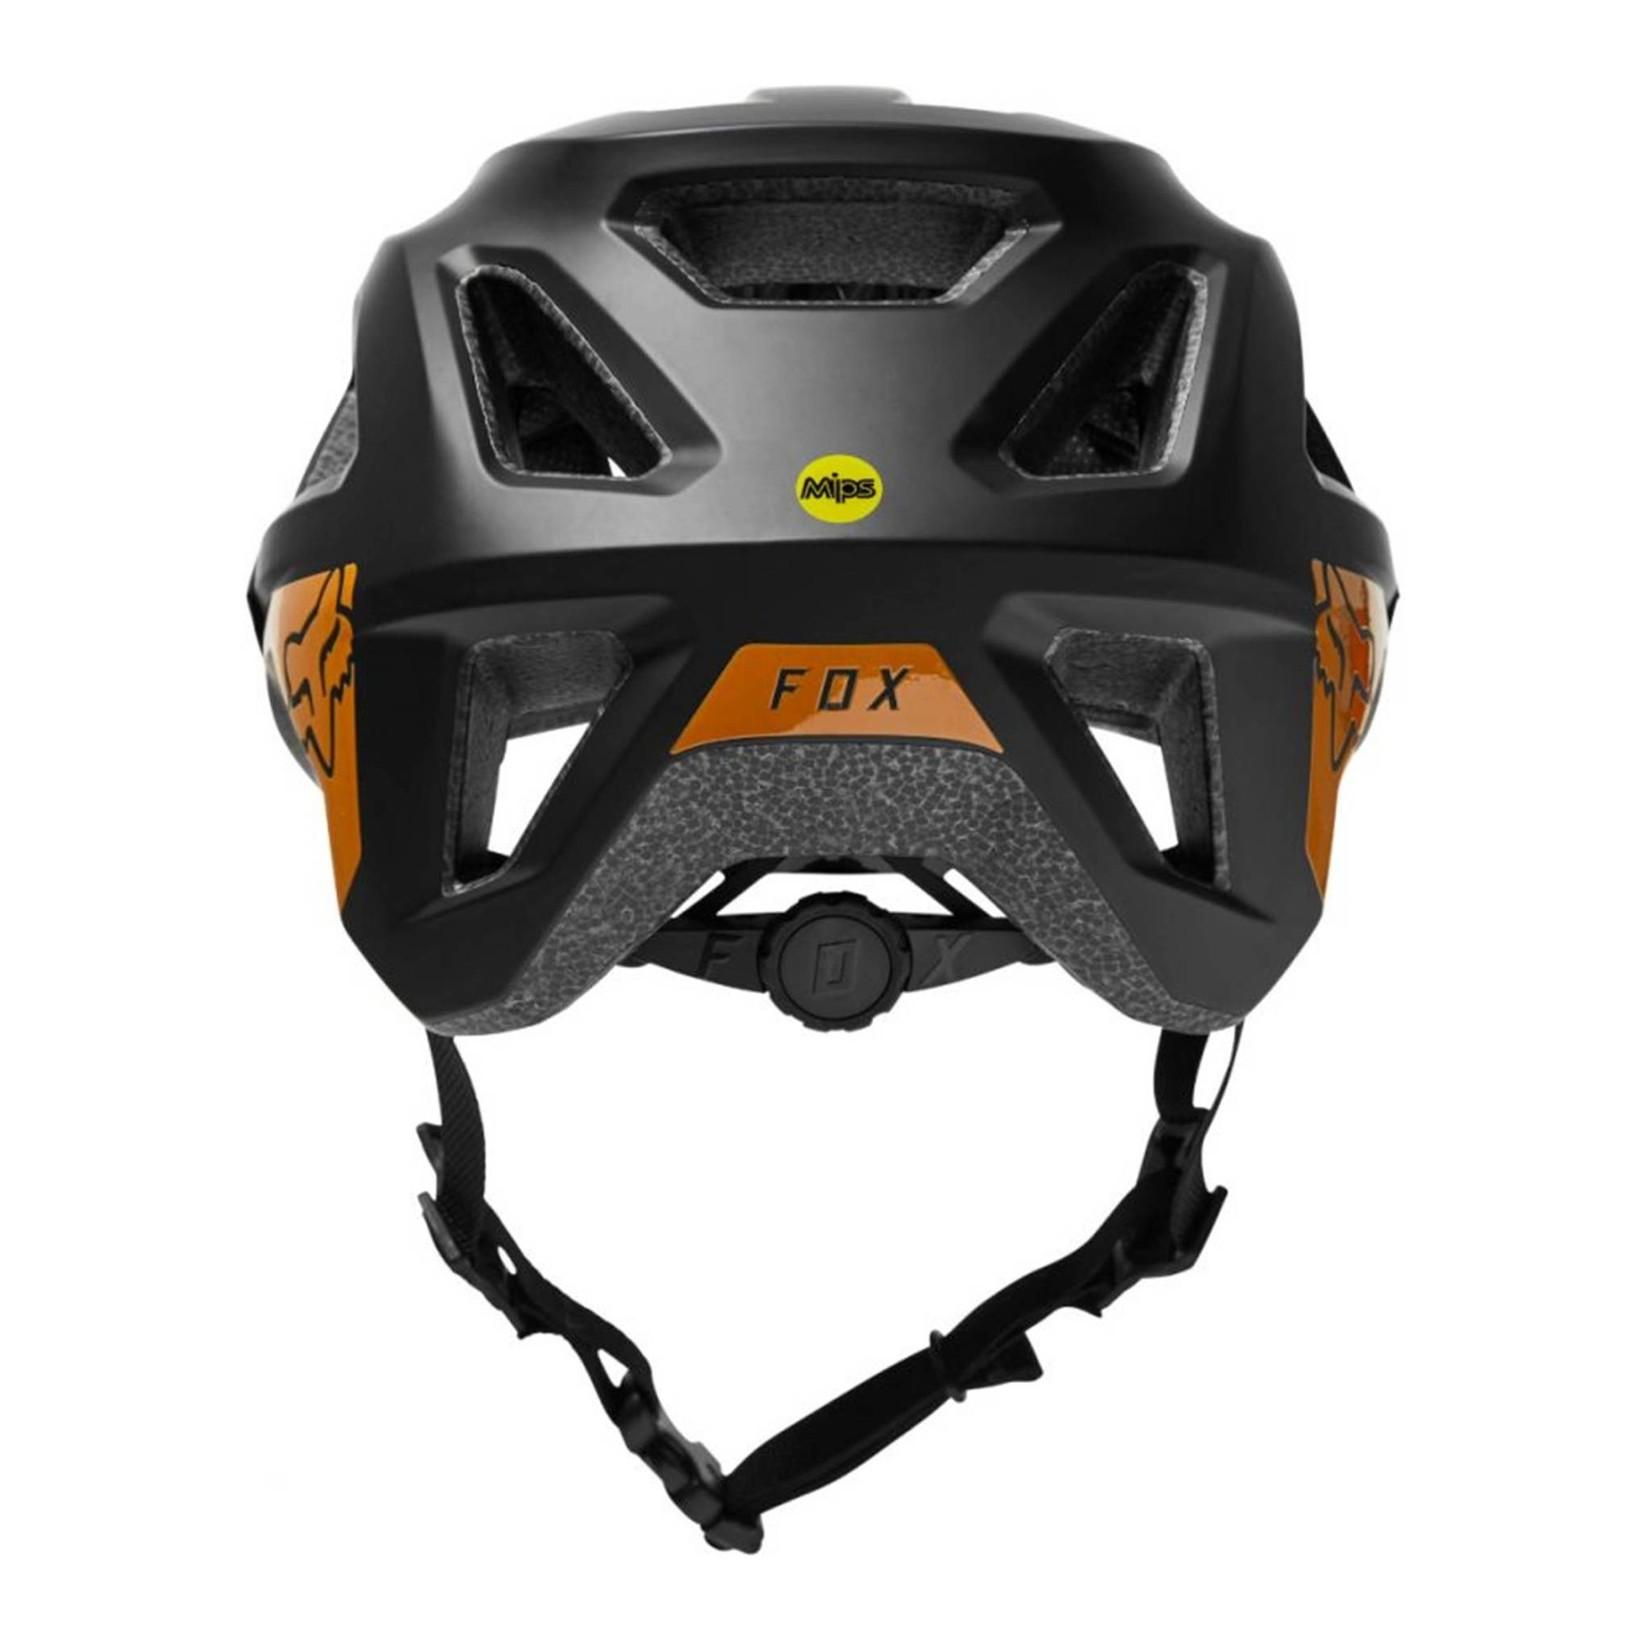 FOX Mainframe MIPS Helmet Black/Gold